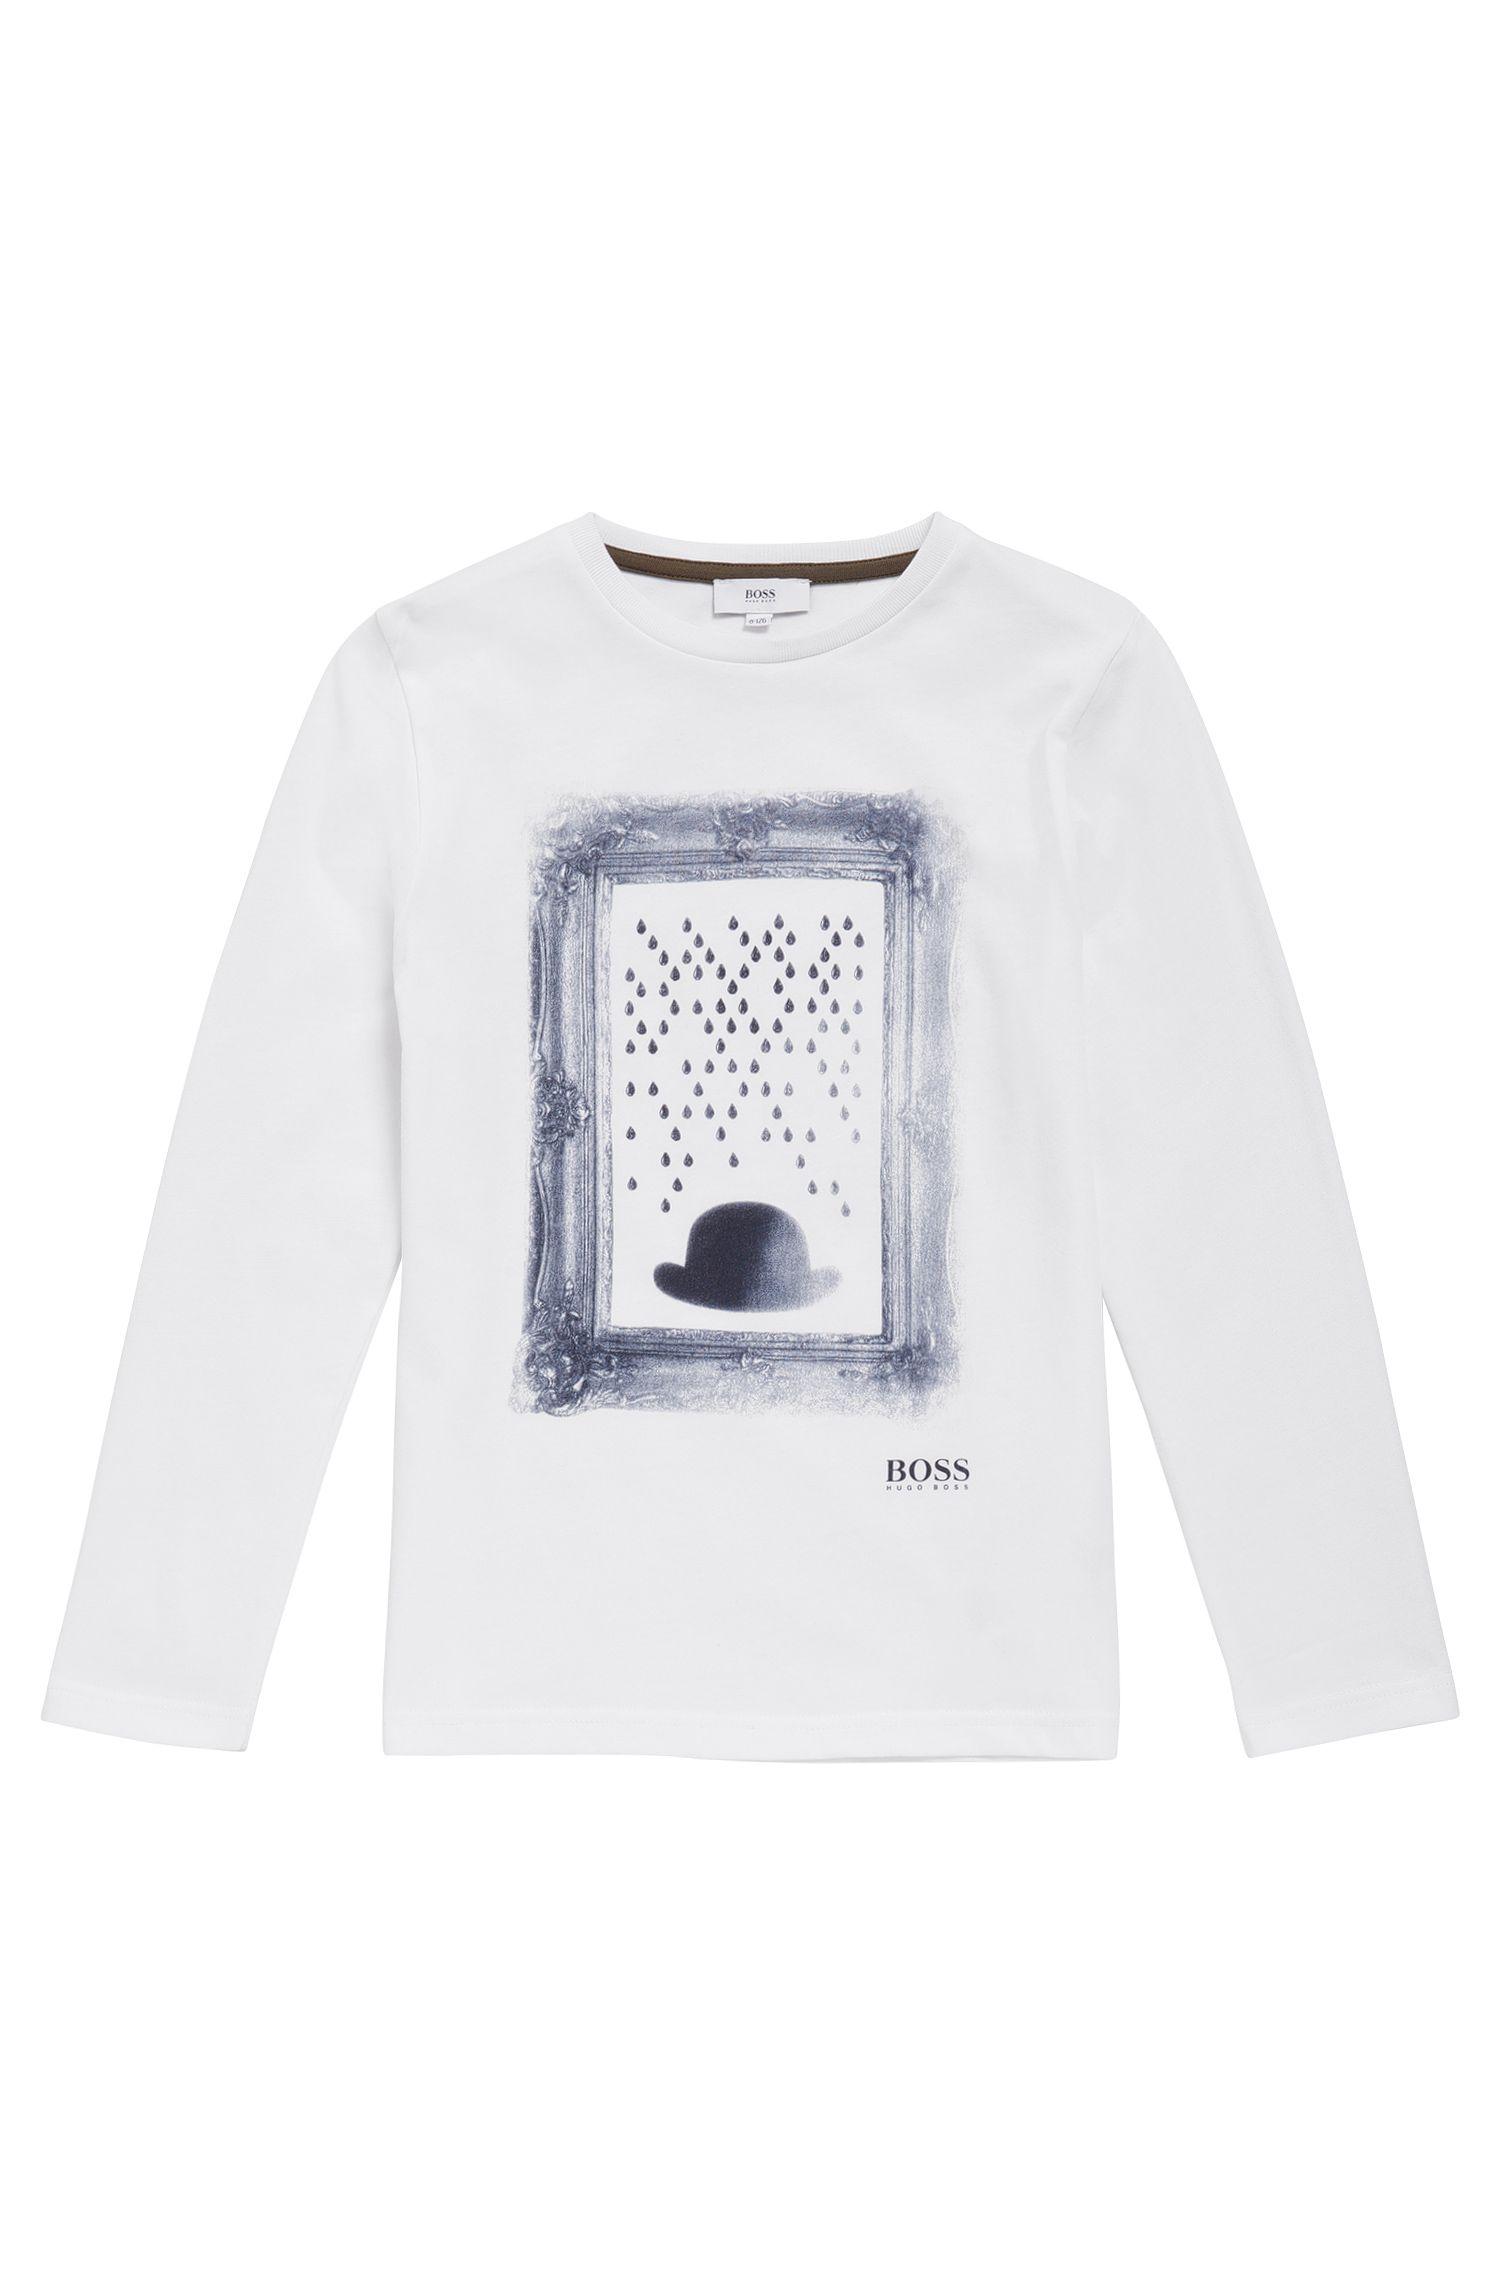 Camiseta de manga larga para niño en algodón con estampado: 'J25A05'